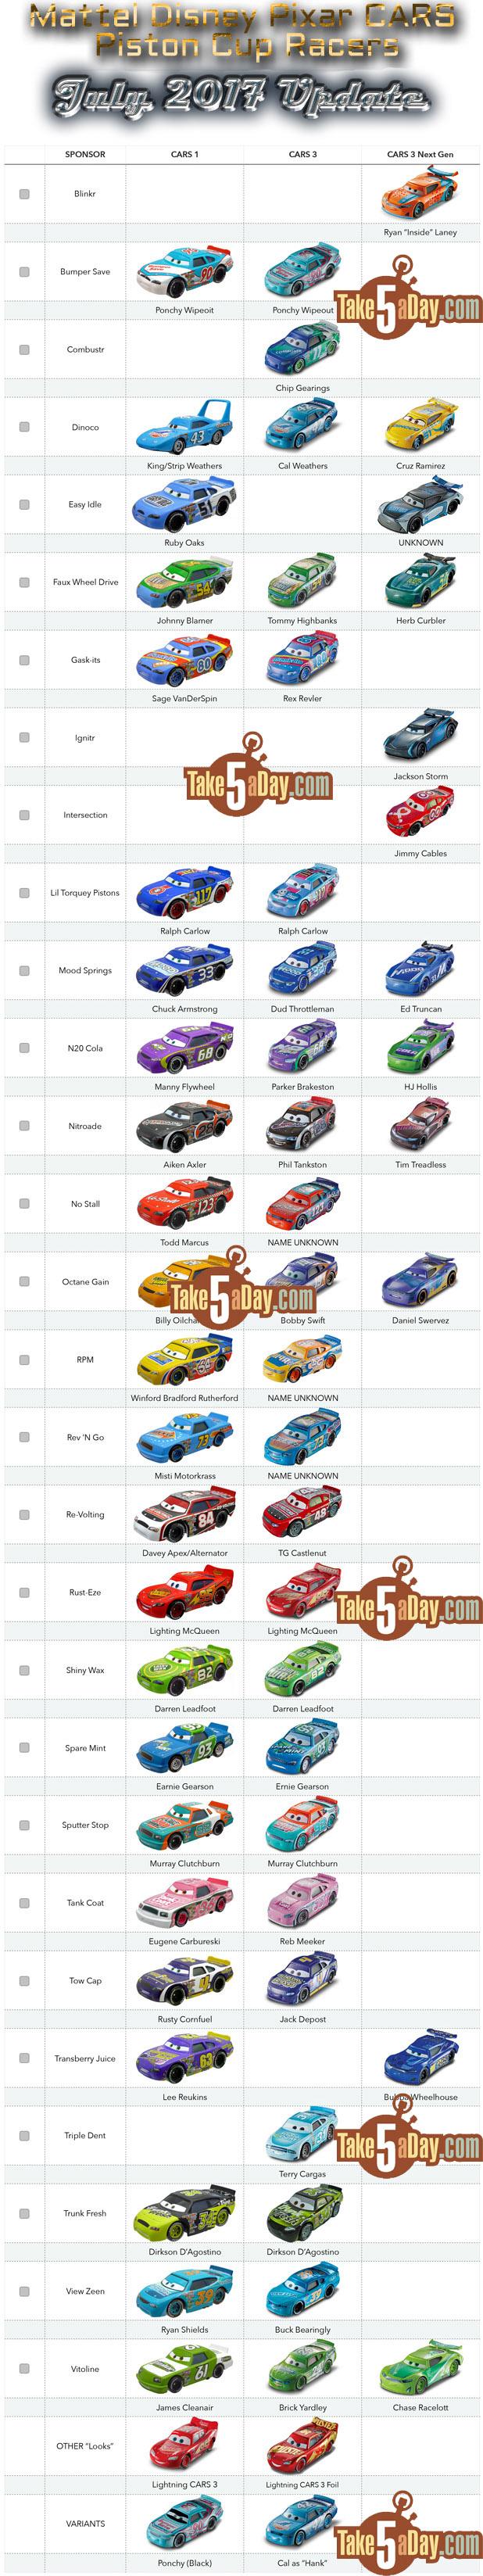 Mattel disney pixar cars 3 piston cup racers cars 1 to cars 3 visual - Mattel Disney Pixar Cars 3 Piston Cup Racers Cars 1 To Cars 3 July Update